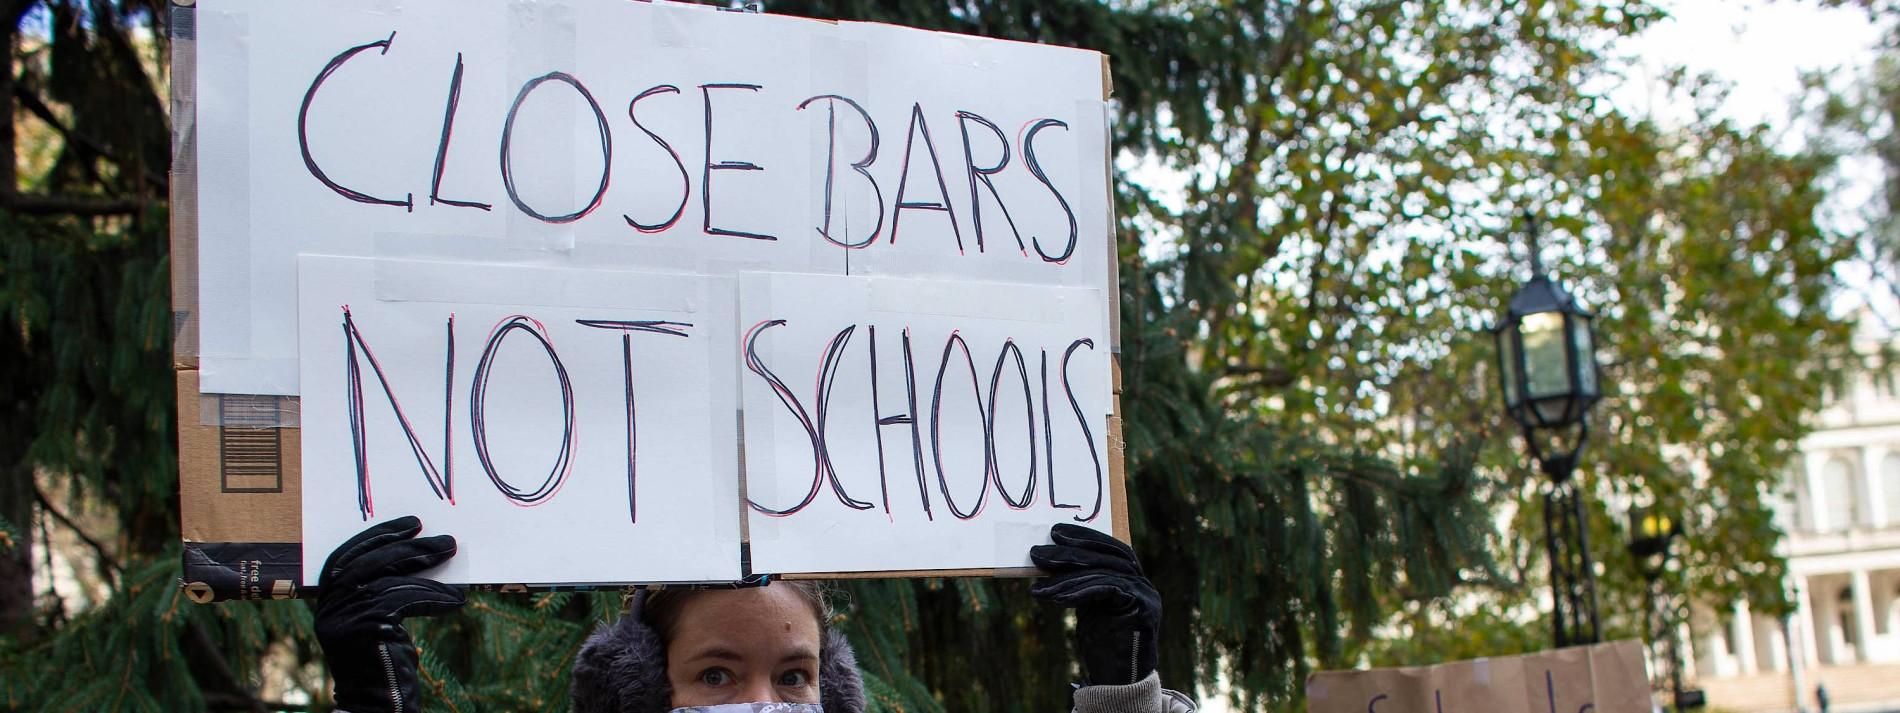 New Yorker Grundschüler sollen jede Woche getestet werden